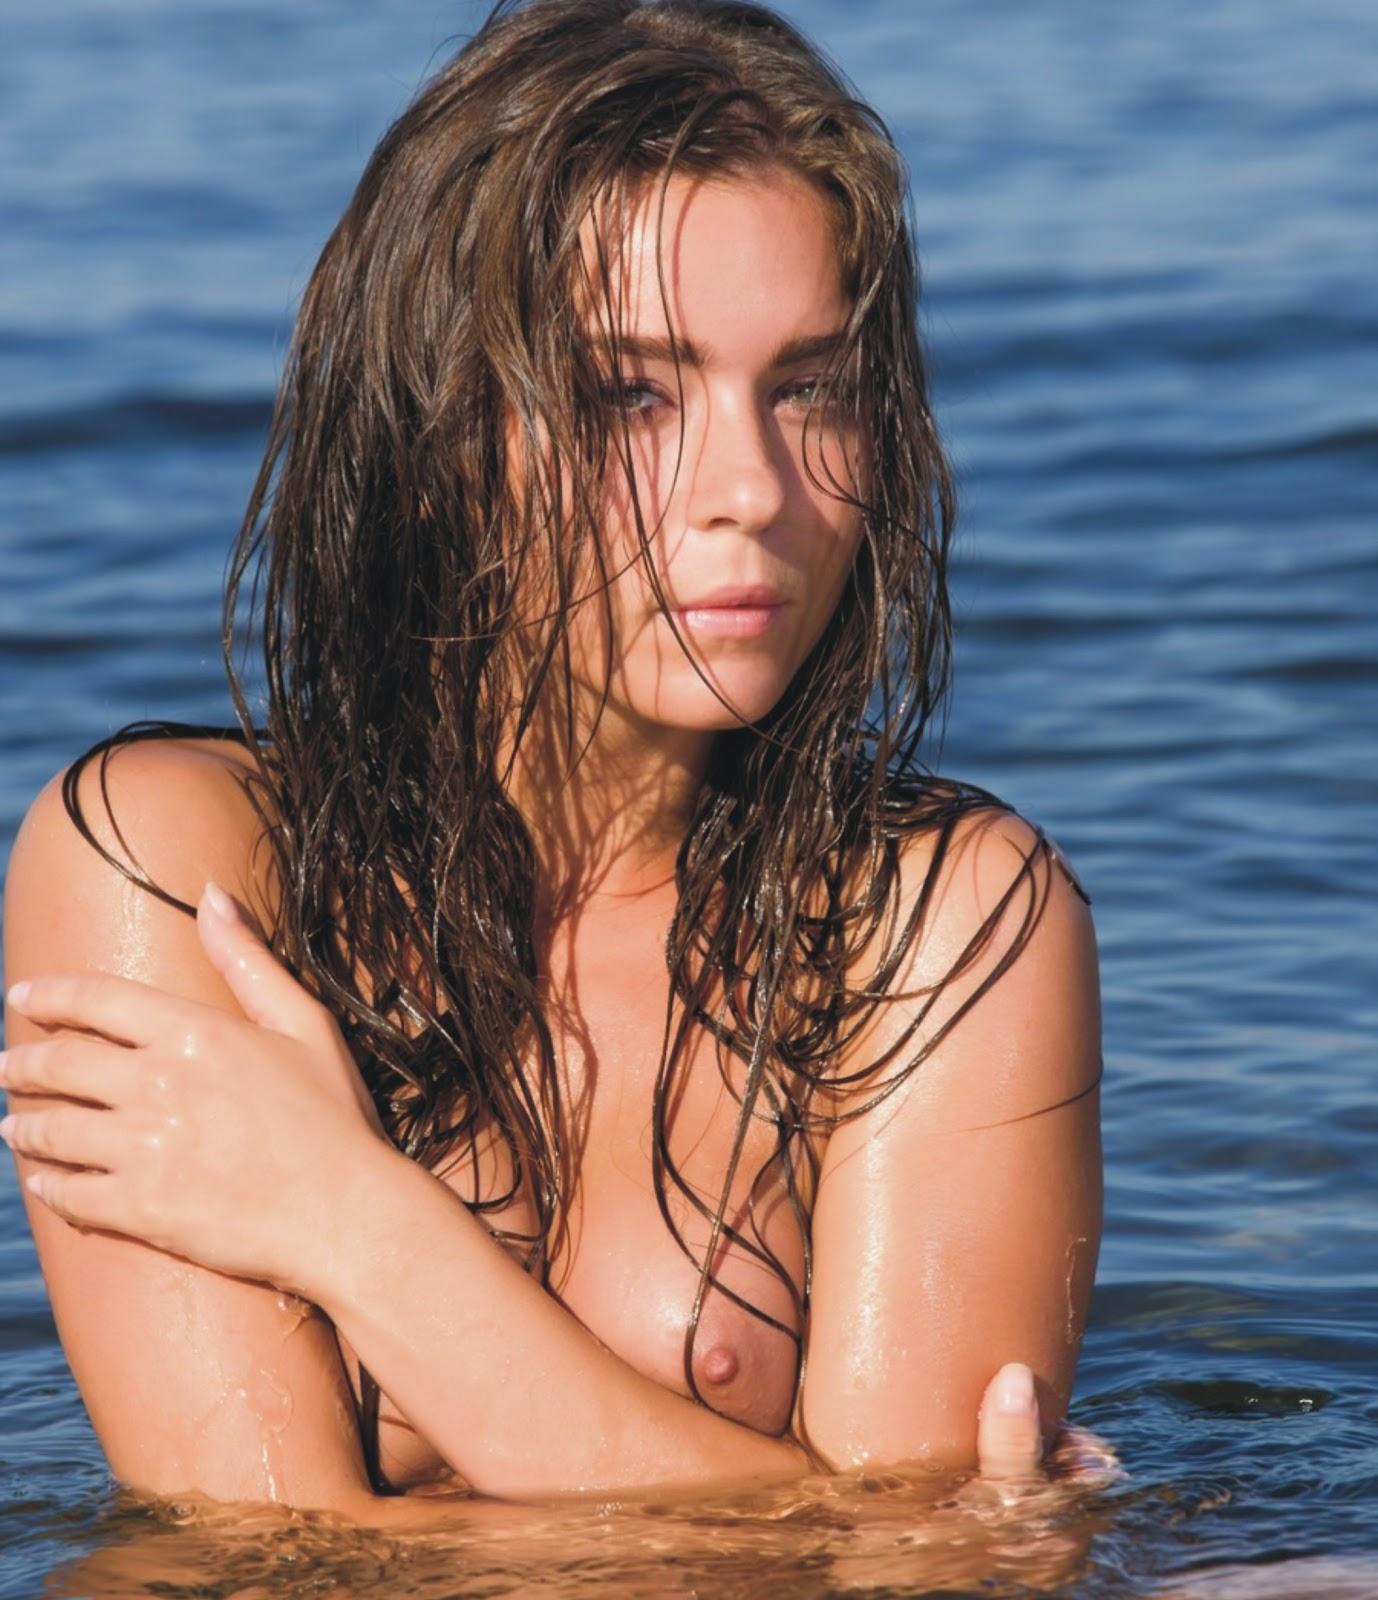 Girls in commercials nude